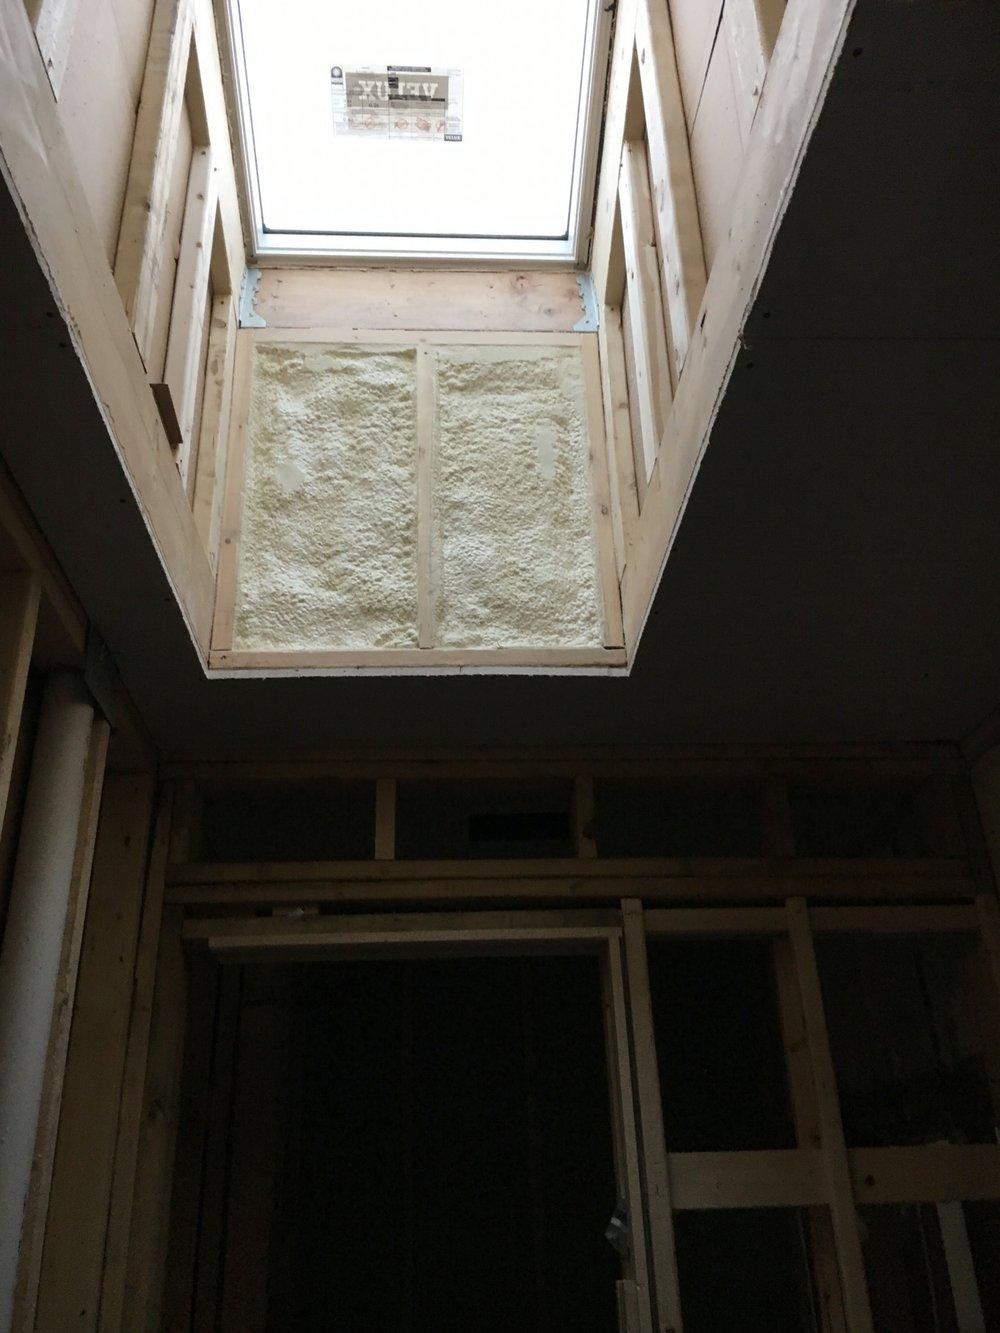 Skylight insulation detail